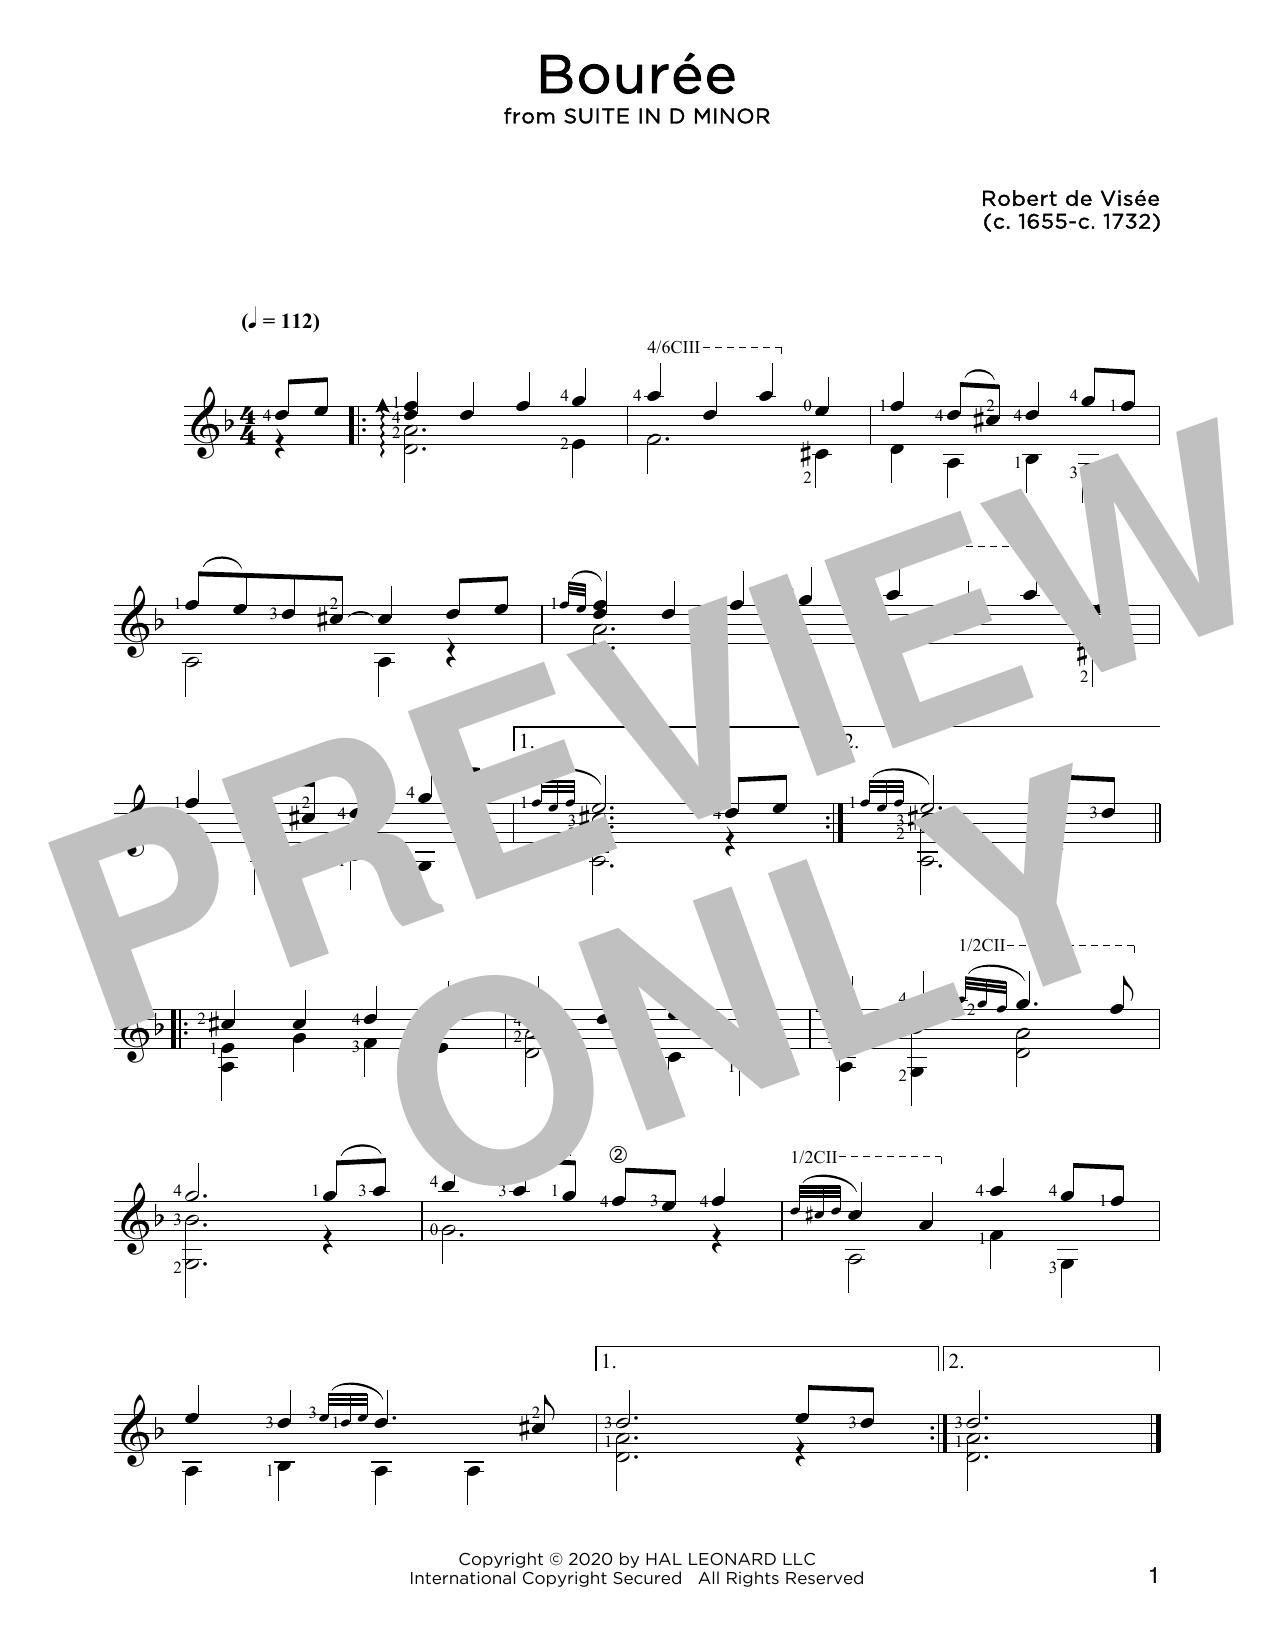 Robert de Visee Bouree sheet music notes and chords. Download Printable PDF.